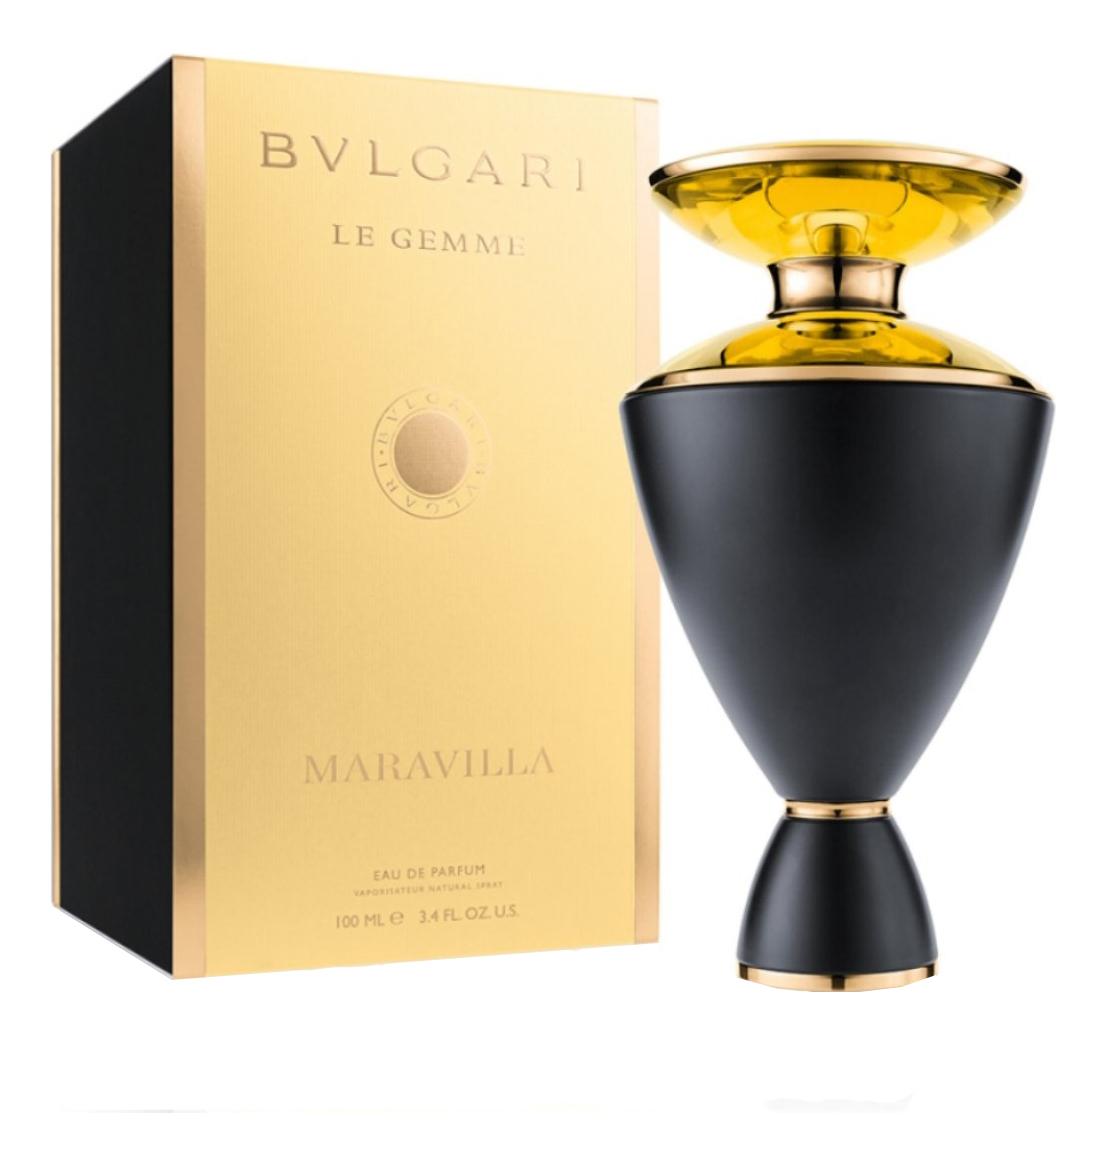 Купить Maravilla: парфюмерная вода 100мл, Bvlgari